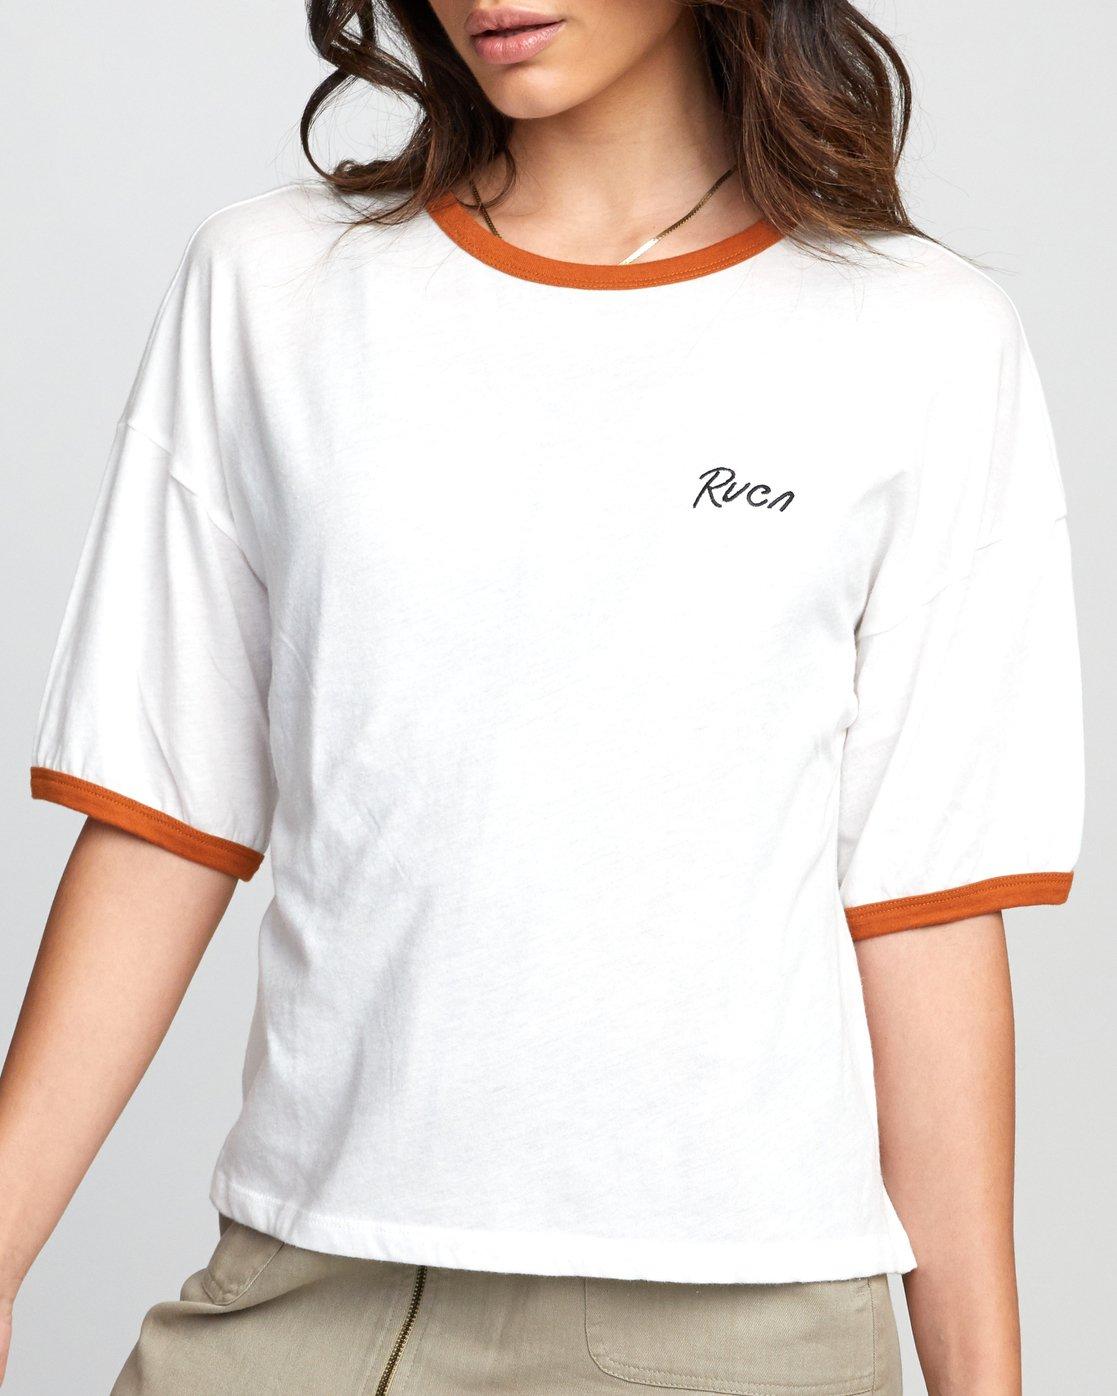 New RVCA Big RVCA Women/'s T-Shirt Vintage White